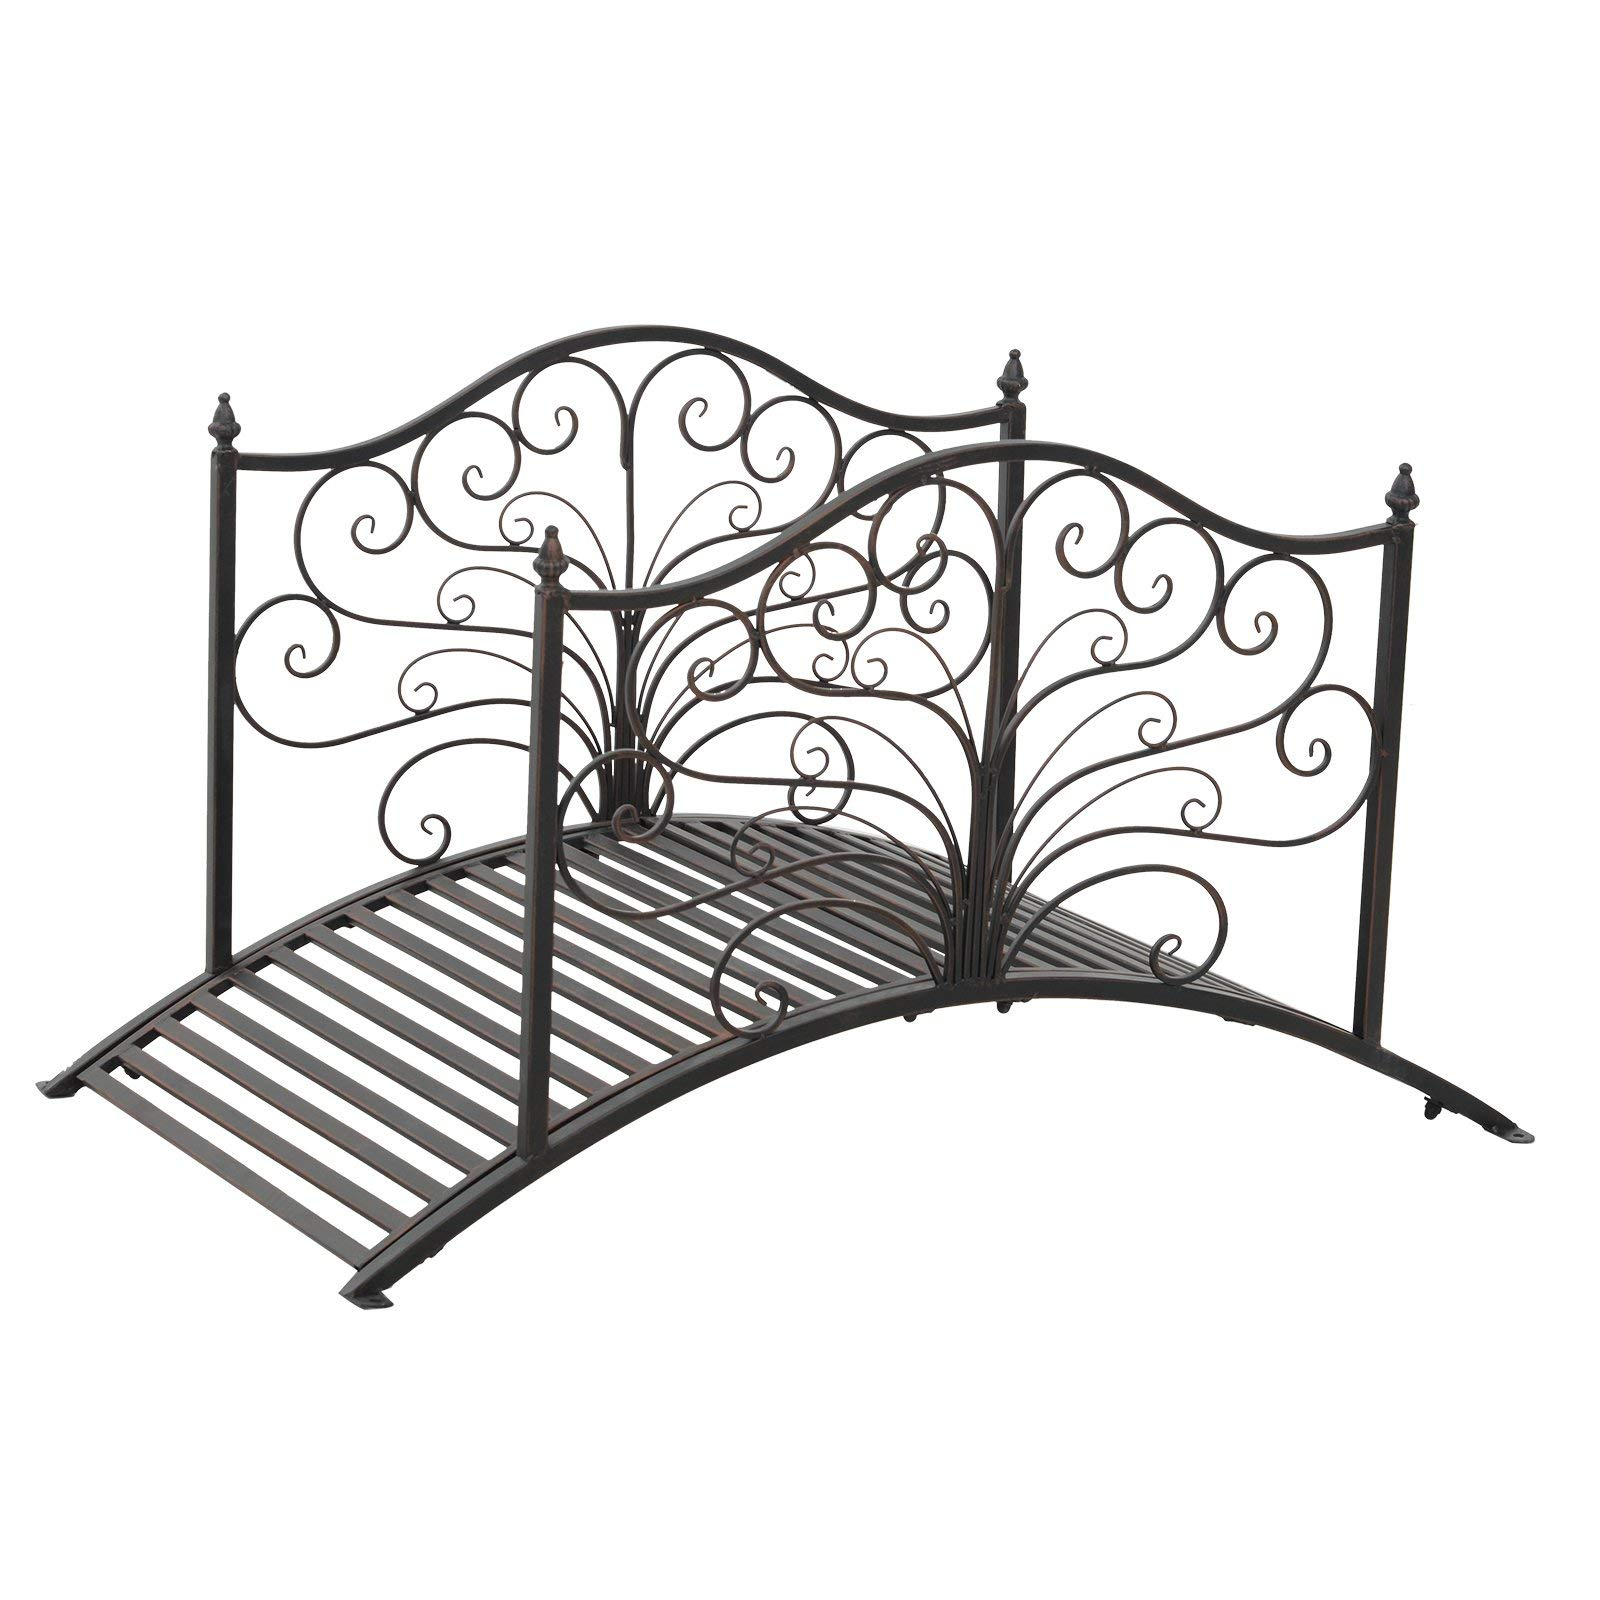 Festnight Outdoor Metal Garden Bridge Patio Backyard Decorative Bridge Black Bronze, 4' by Festnight (Image #2)